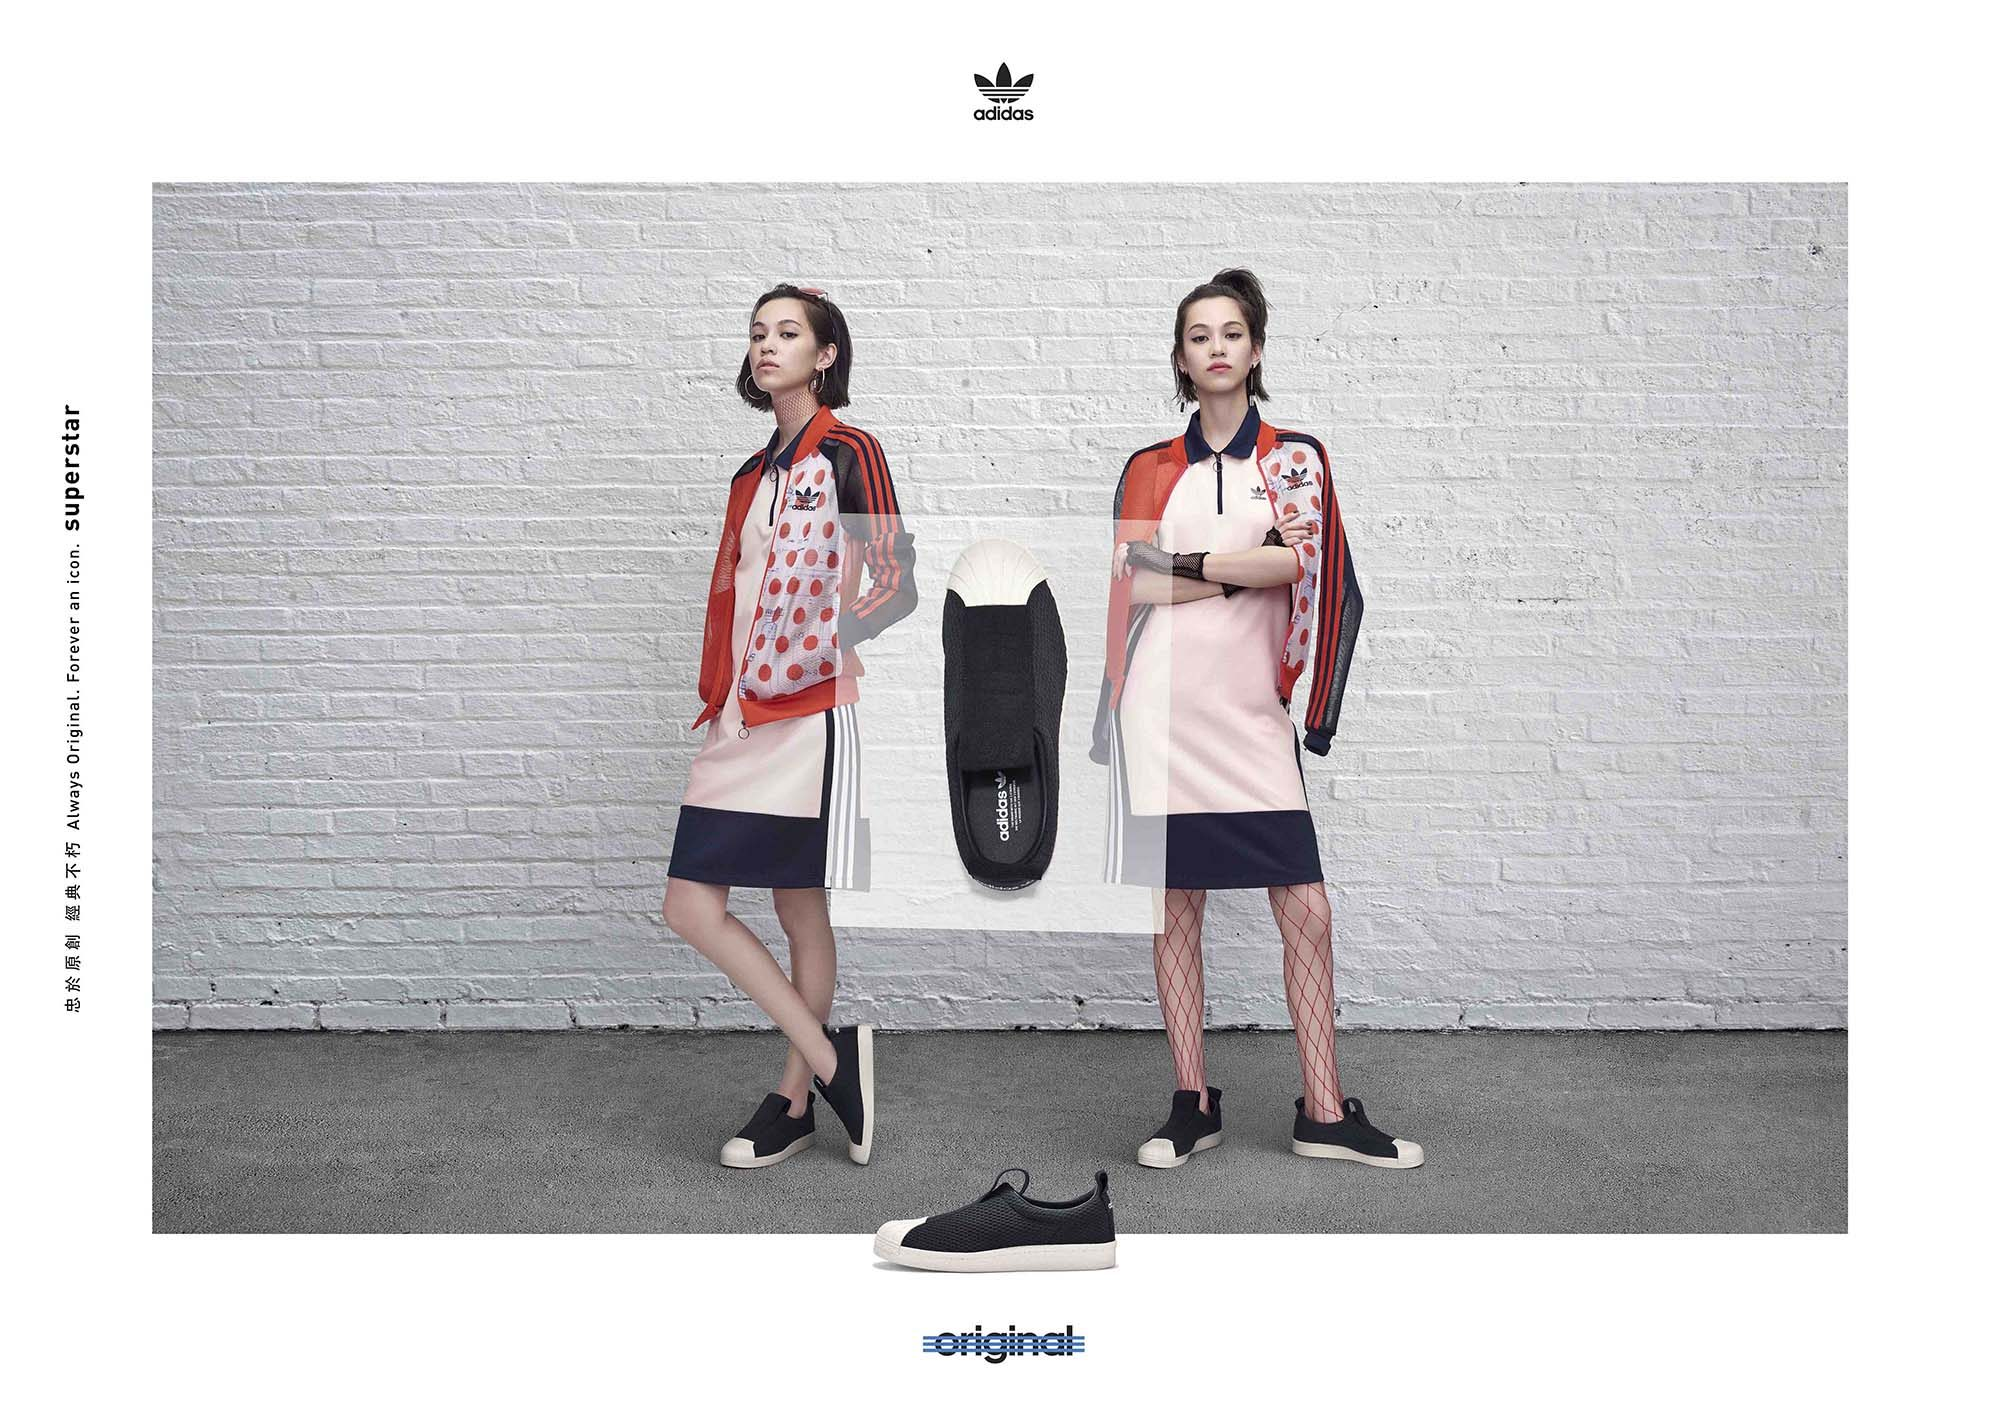 adidas-originals-osaka-wear-series-01